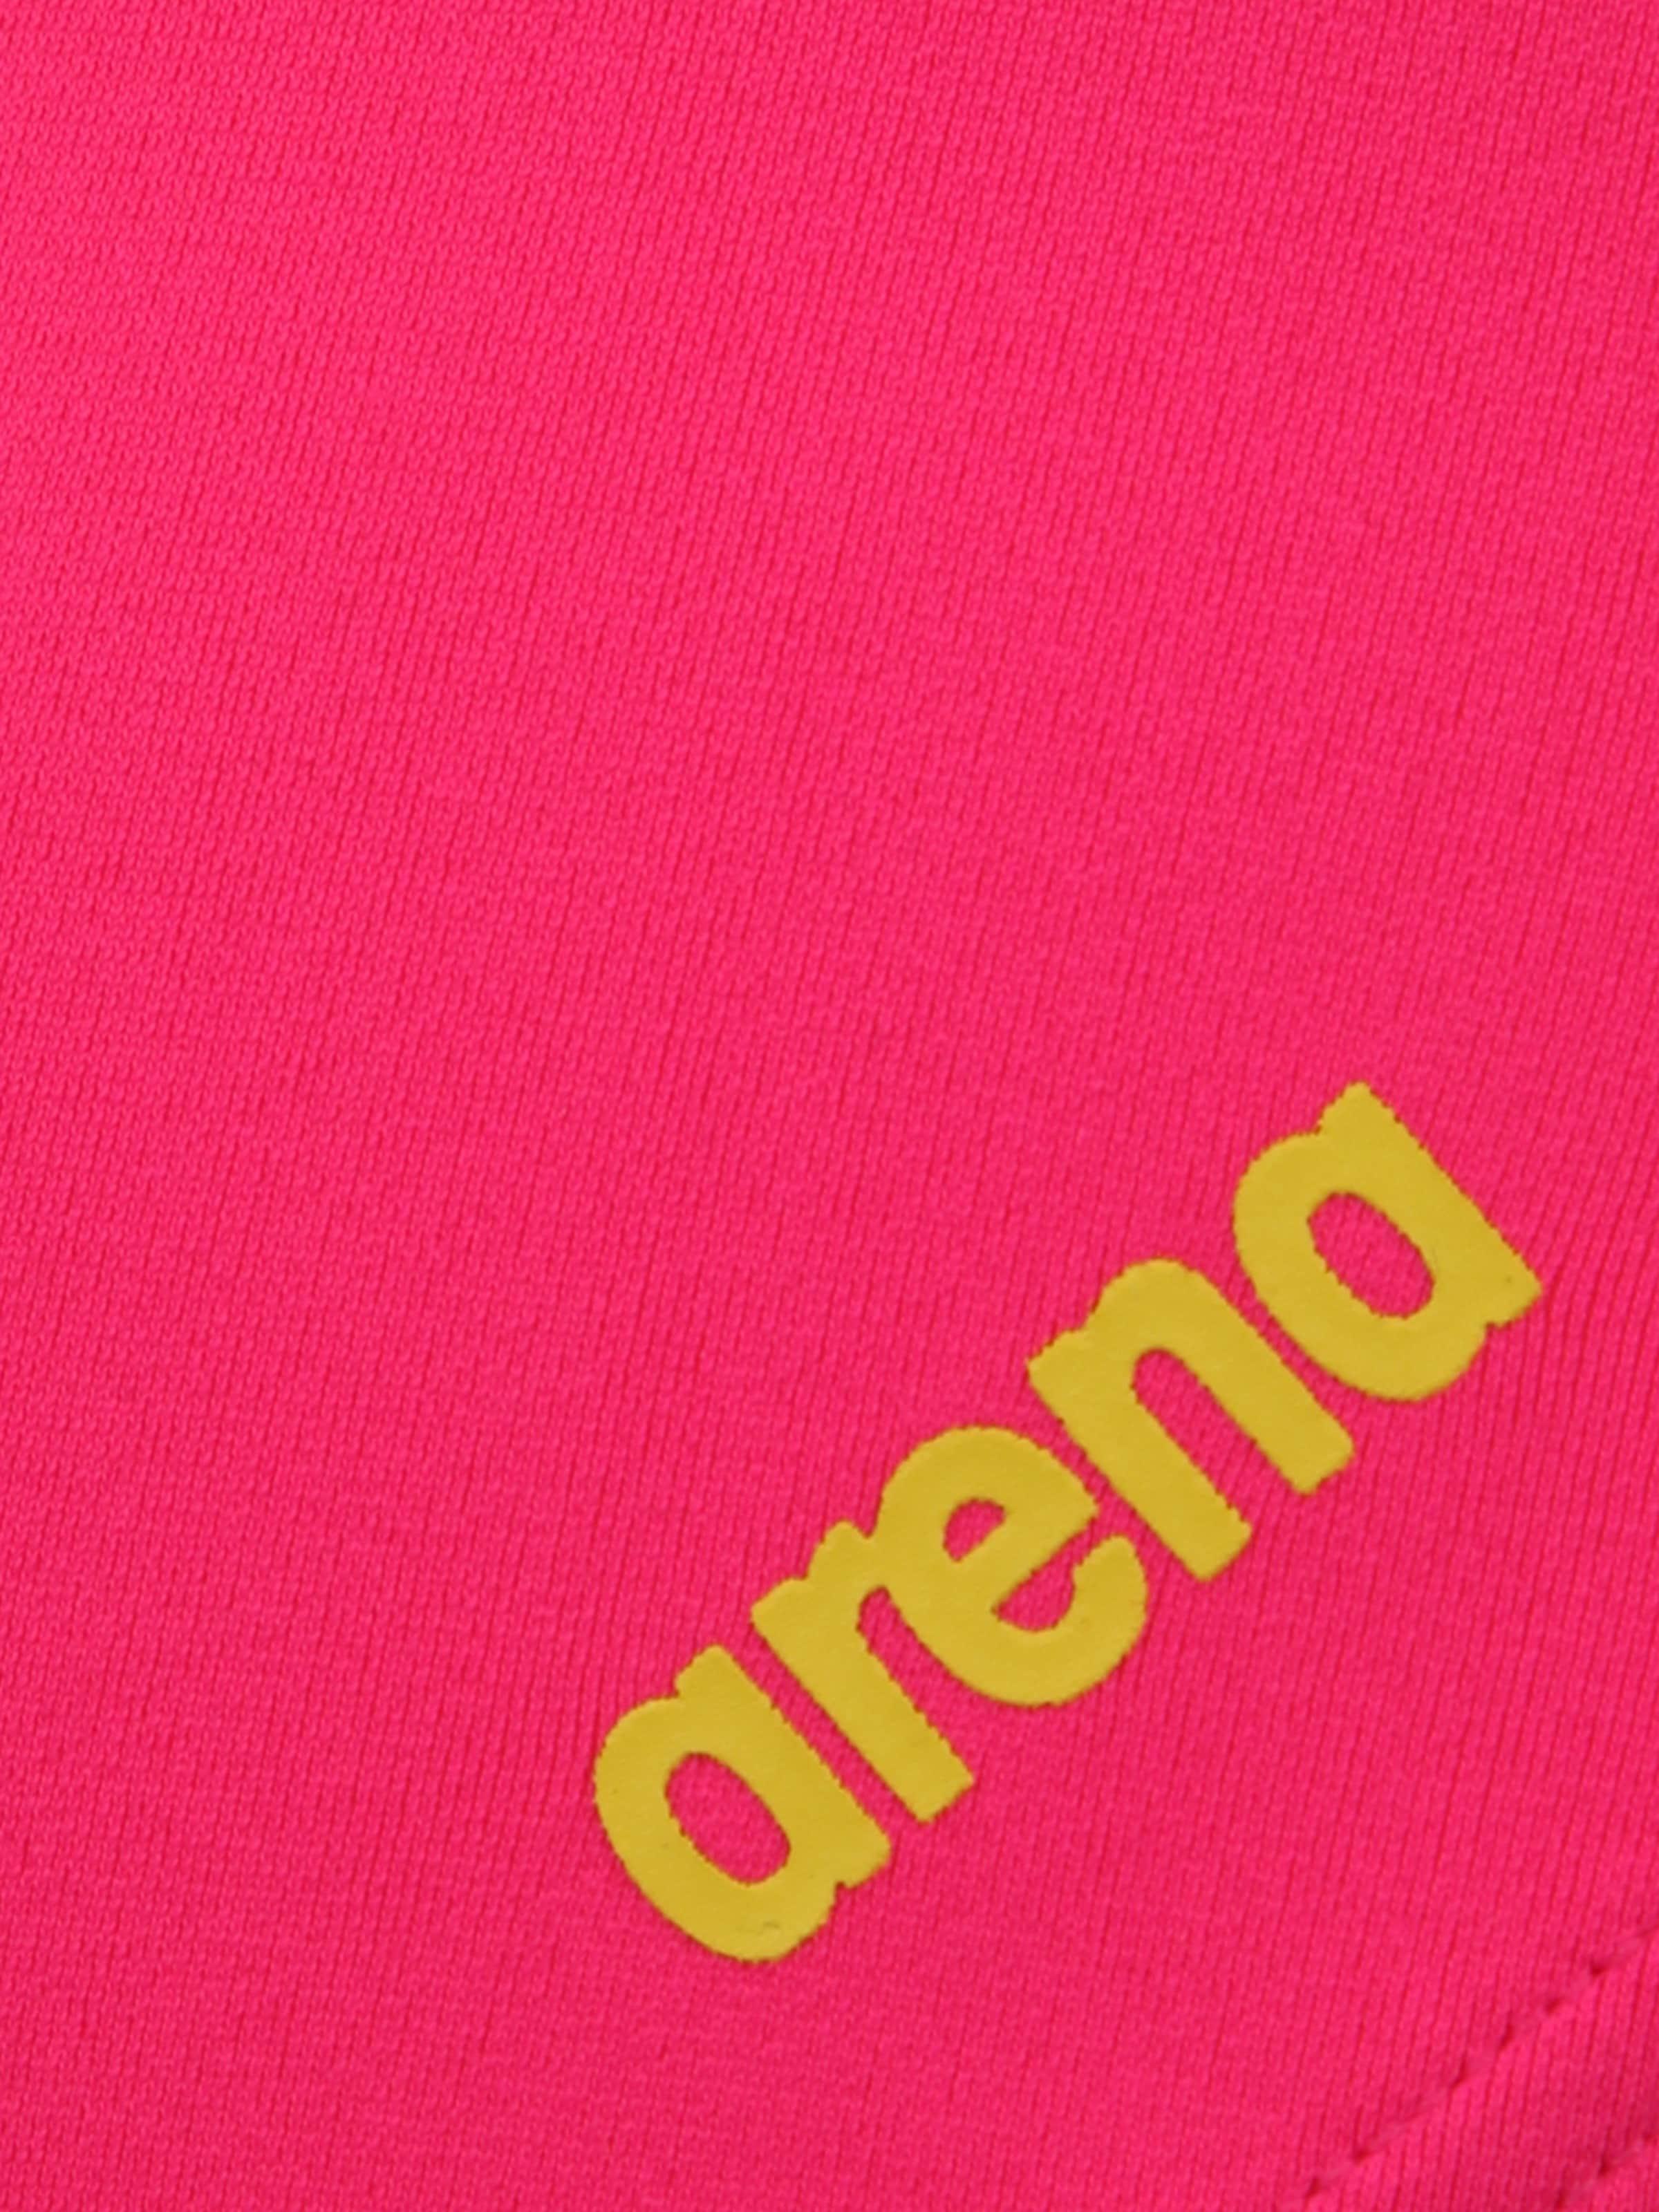 ARENA Bikinihose mit Allover-Muster Auslauf 9cmbUGA3